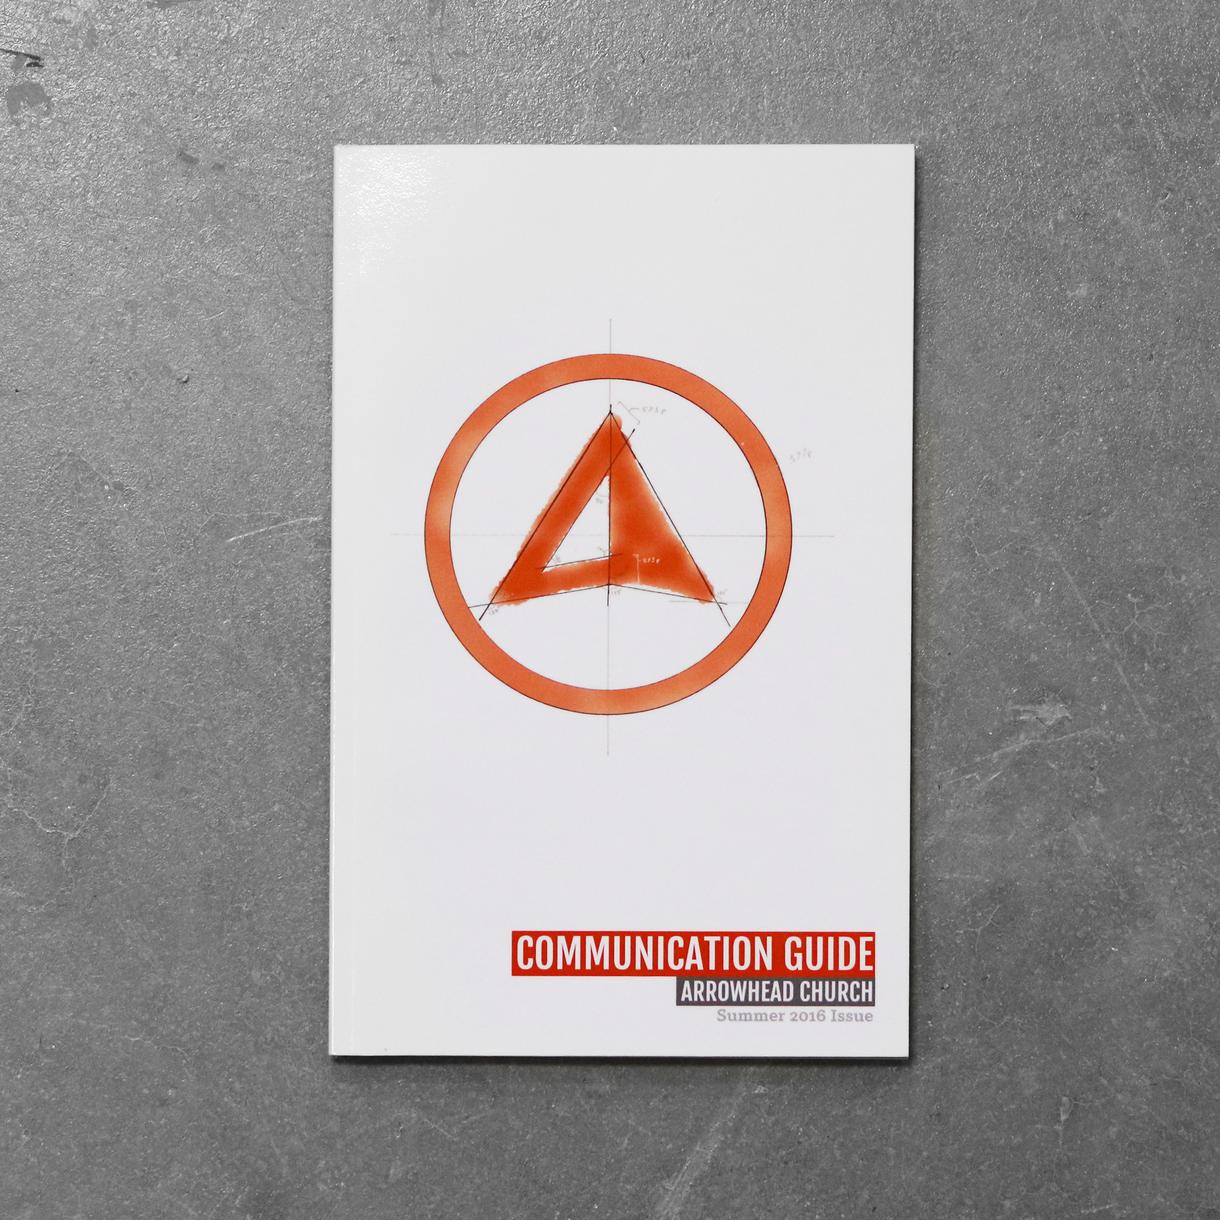 2016 Communication Guide